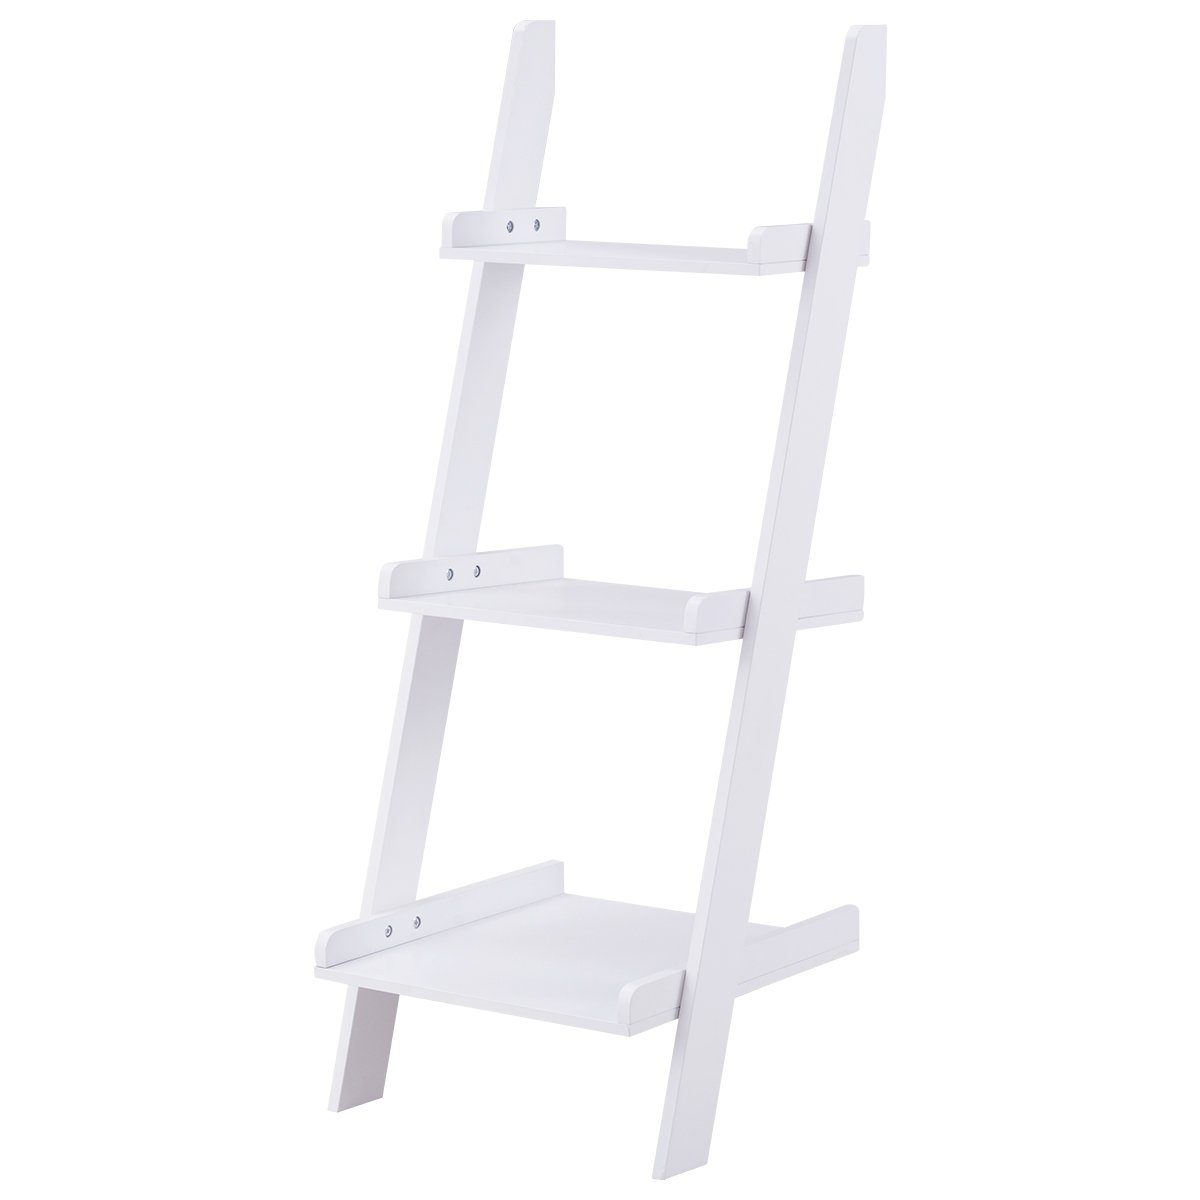 Safeplus Three-layer rack Wooden shelf Home E1 MDF 3-Shelf Ladder Bookcase, White